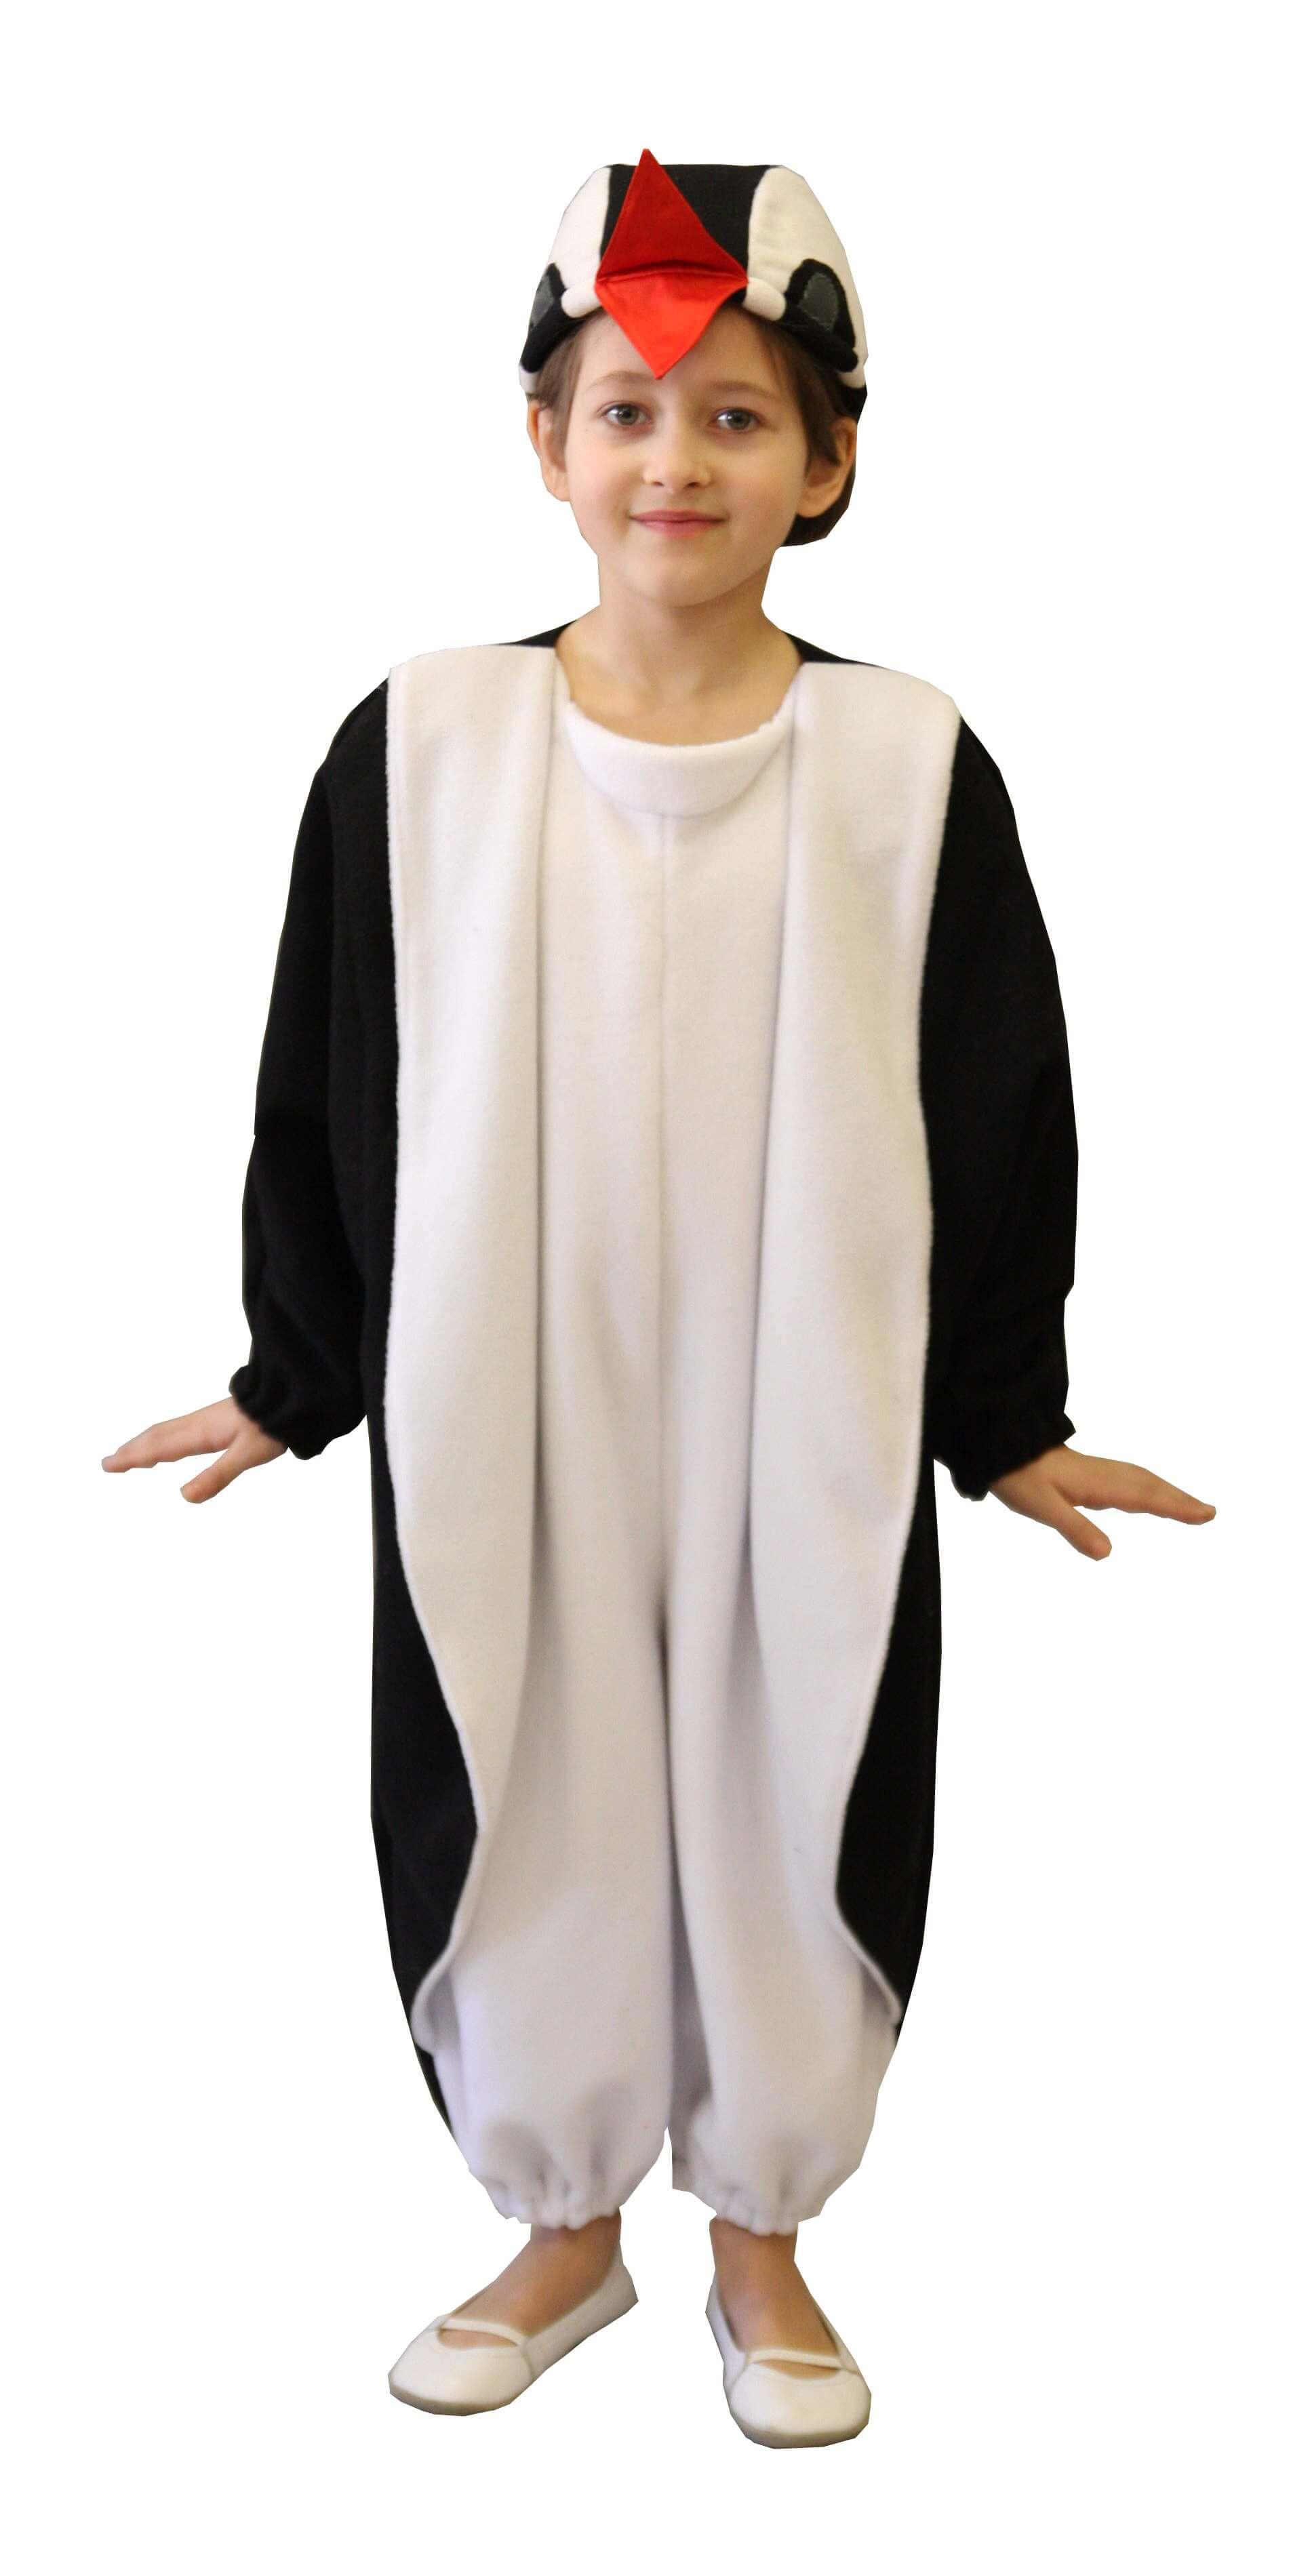 Pingvinuko kostiumas. Kaina 13 Eur.